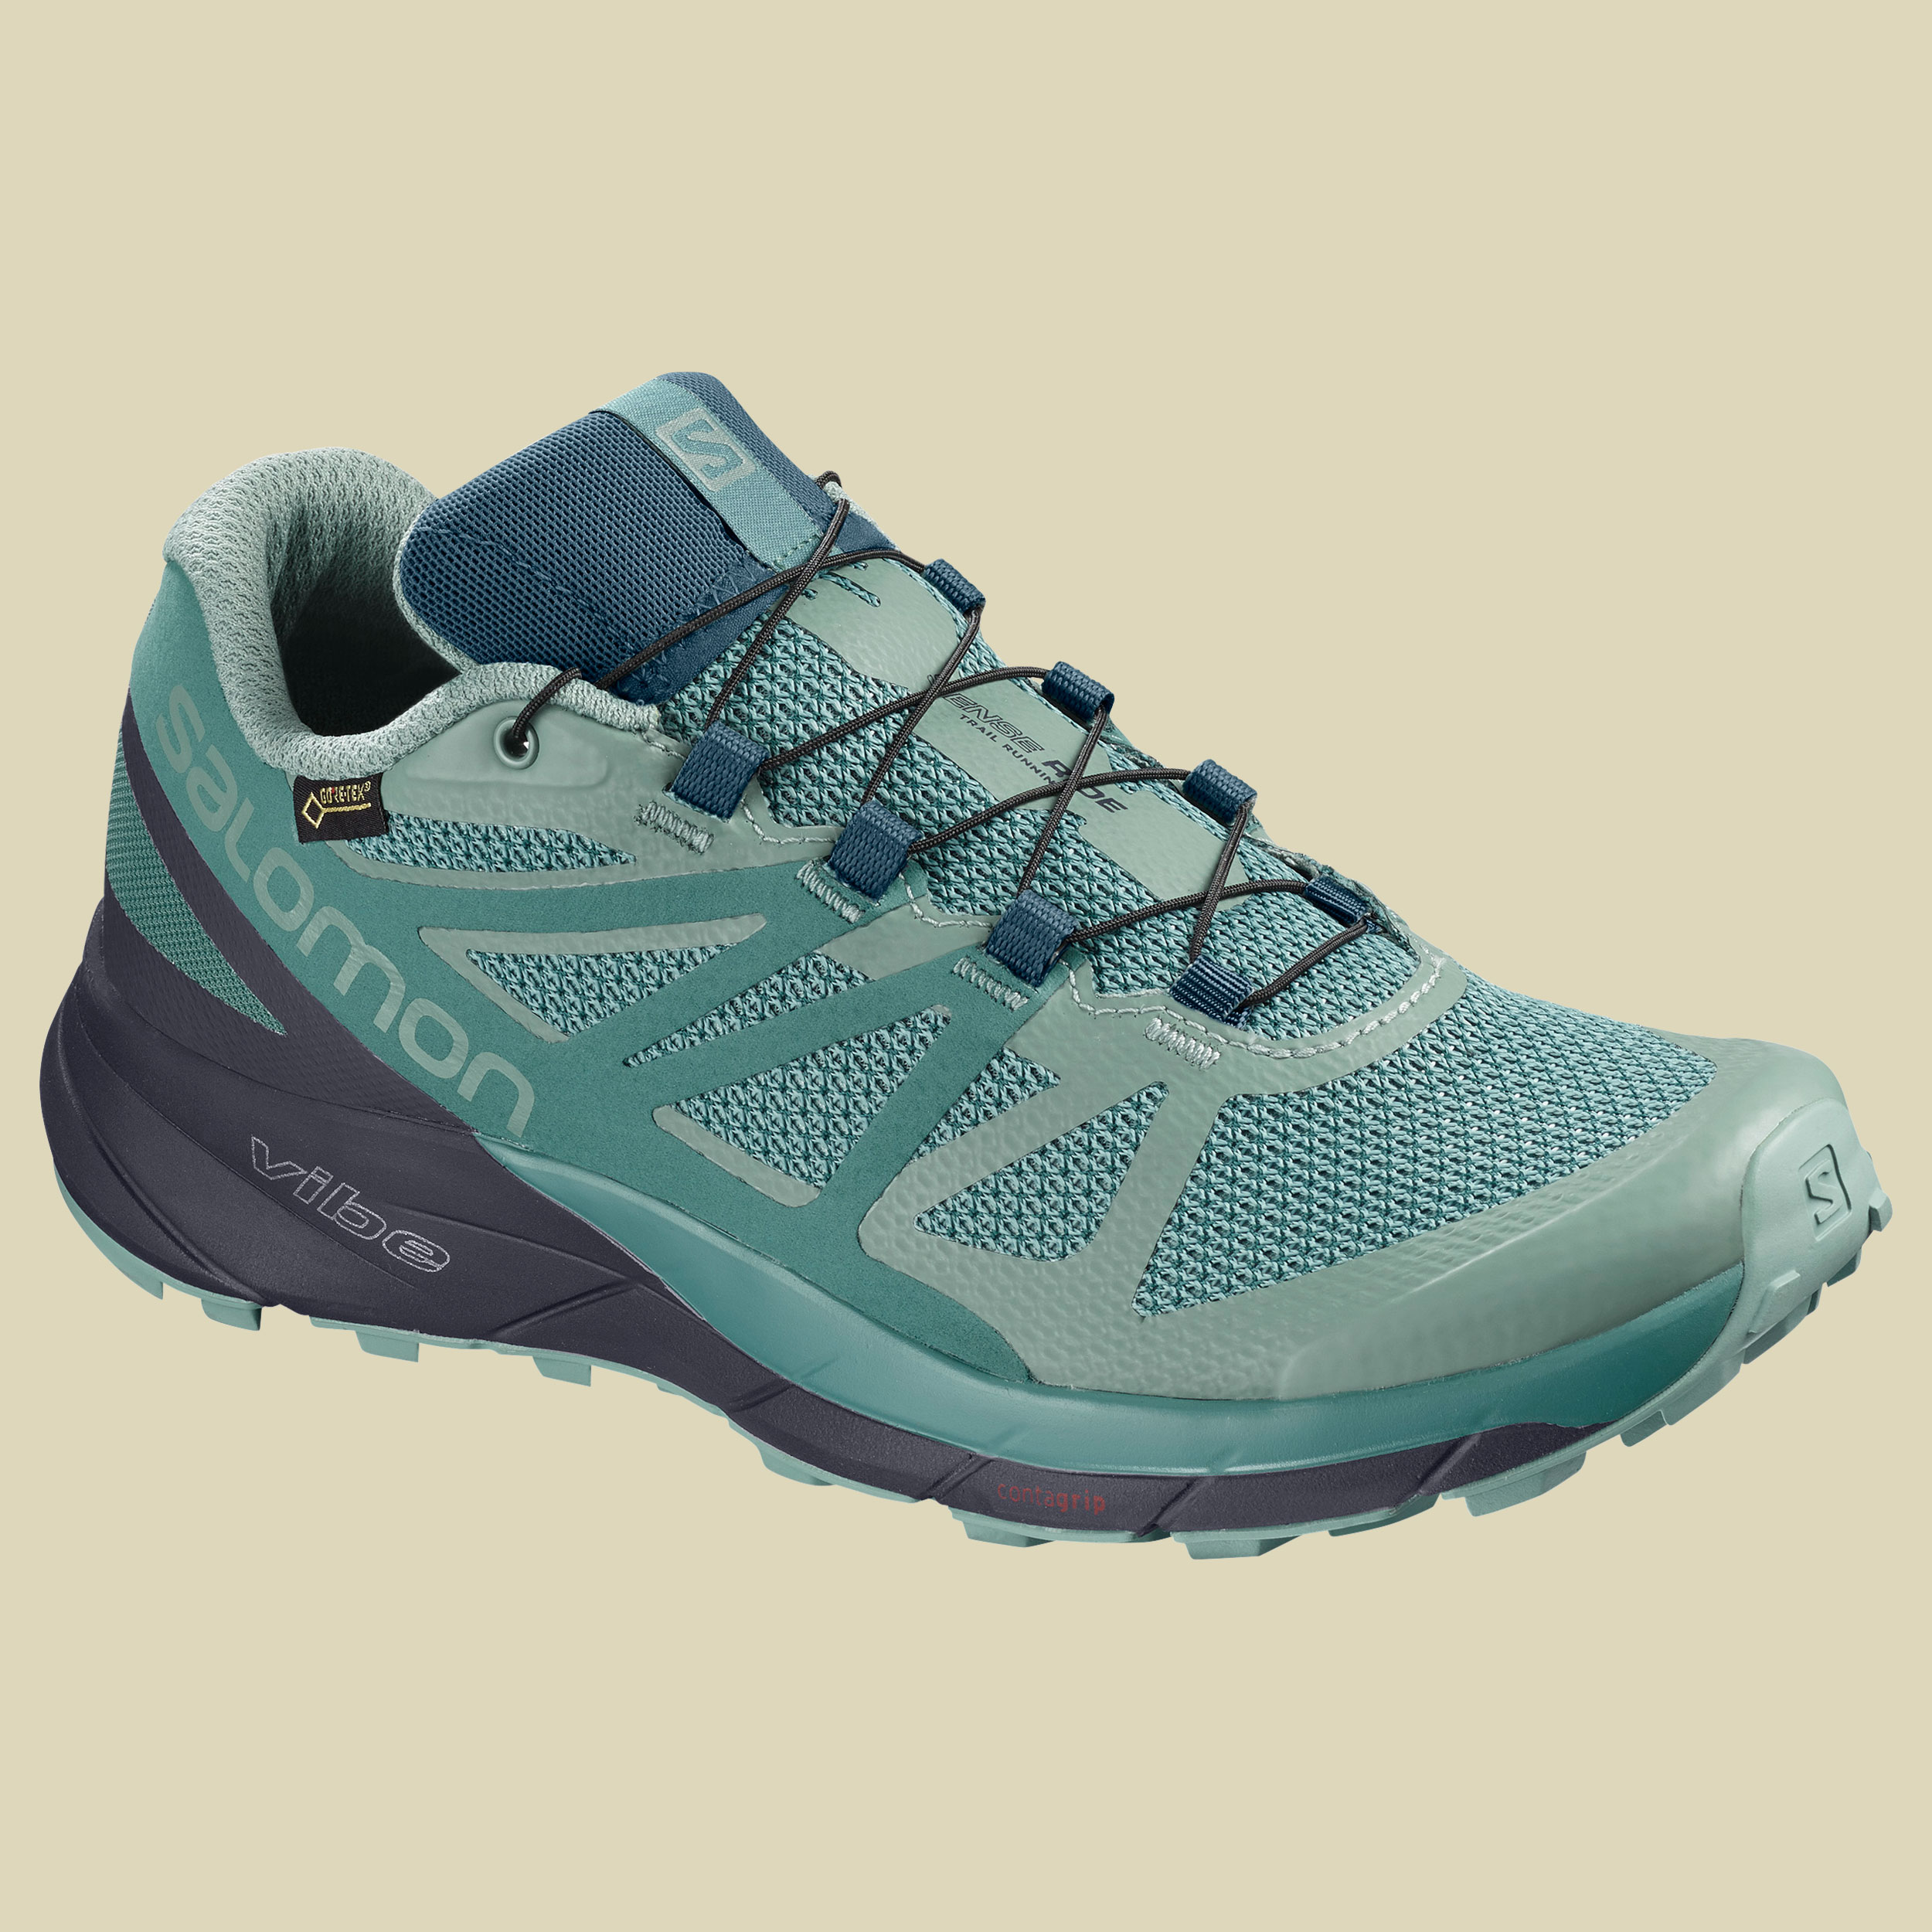 Salomon Sense Ride GTX Invisible Fit Women Damen Laufschuh Größe UK 5,5 trellis/graphite